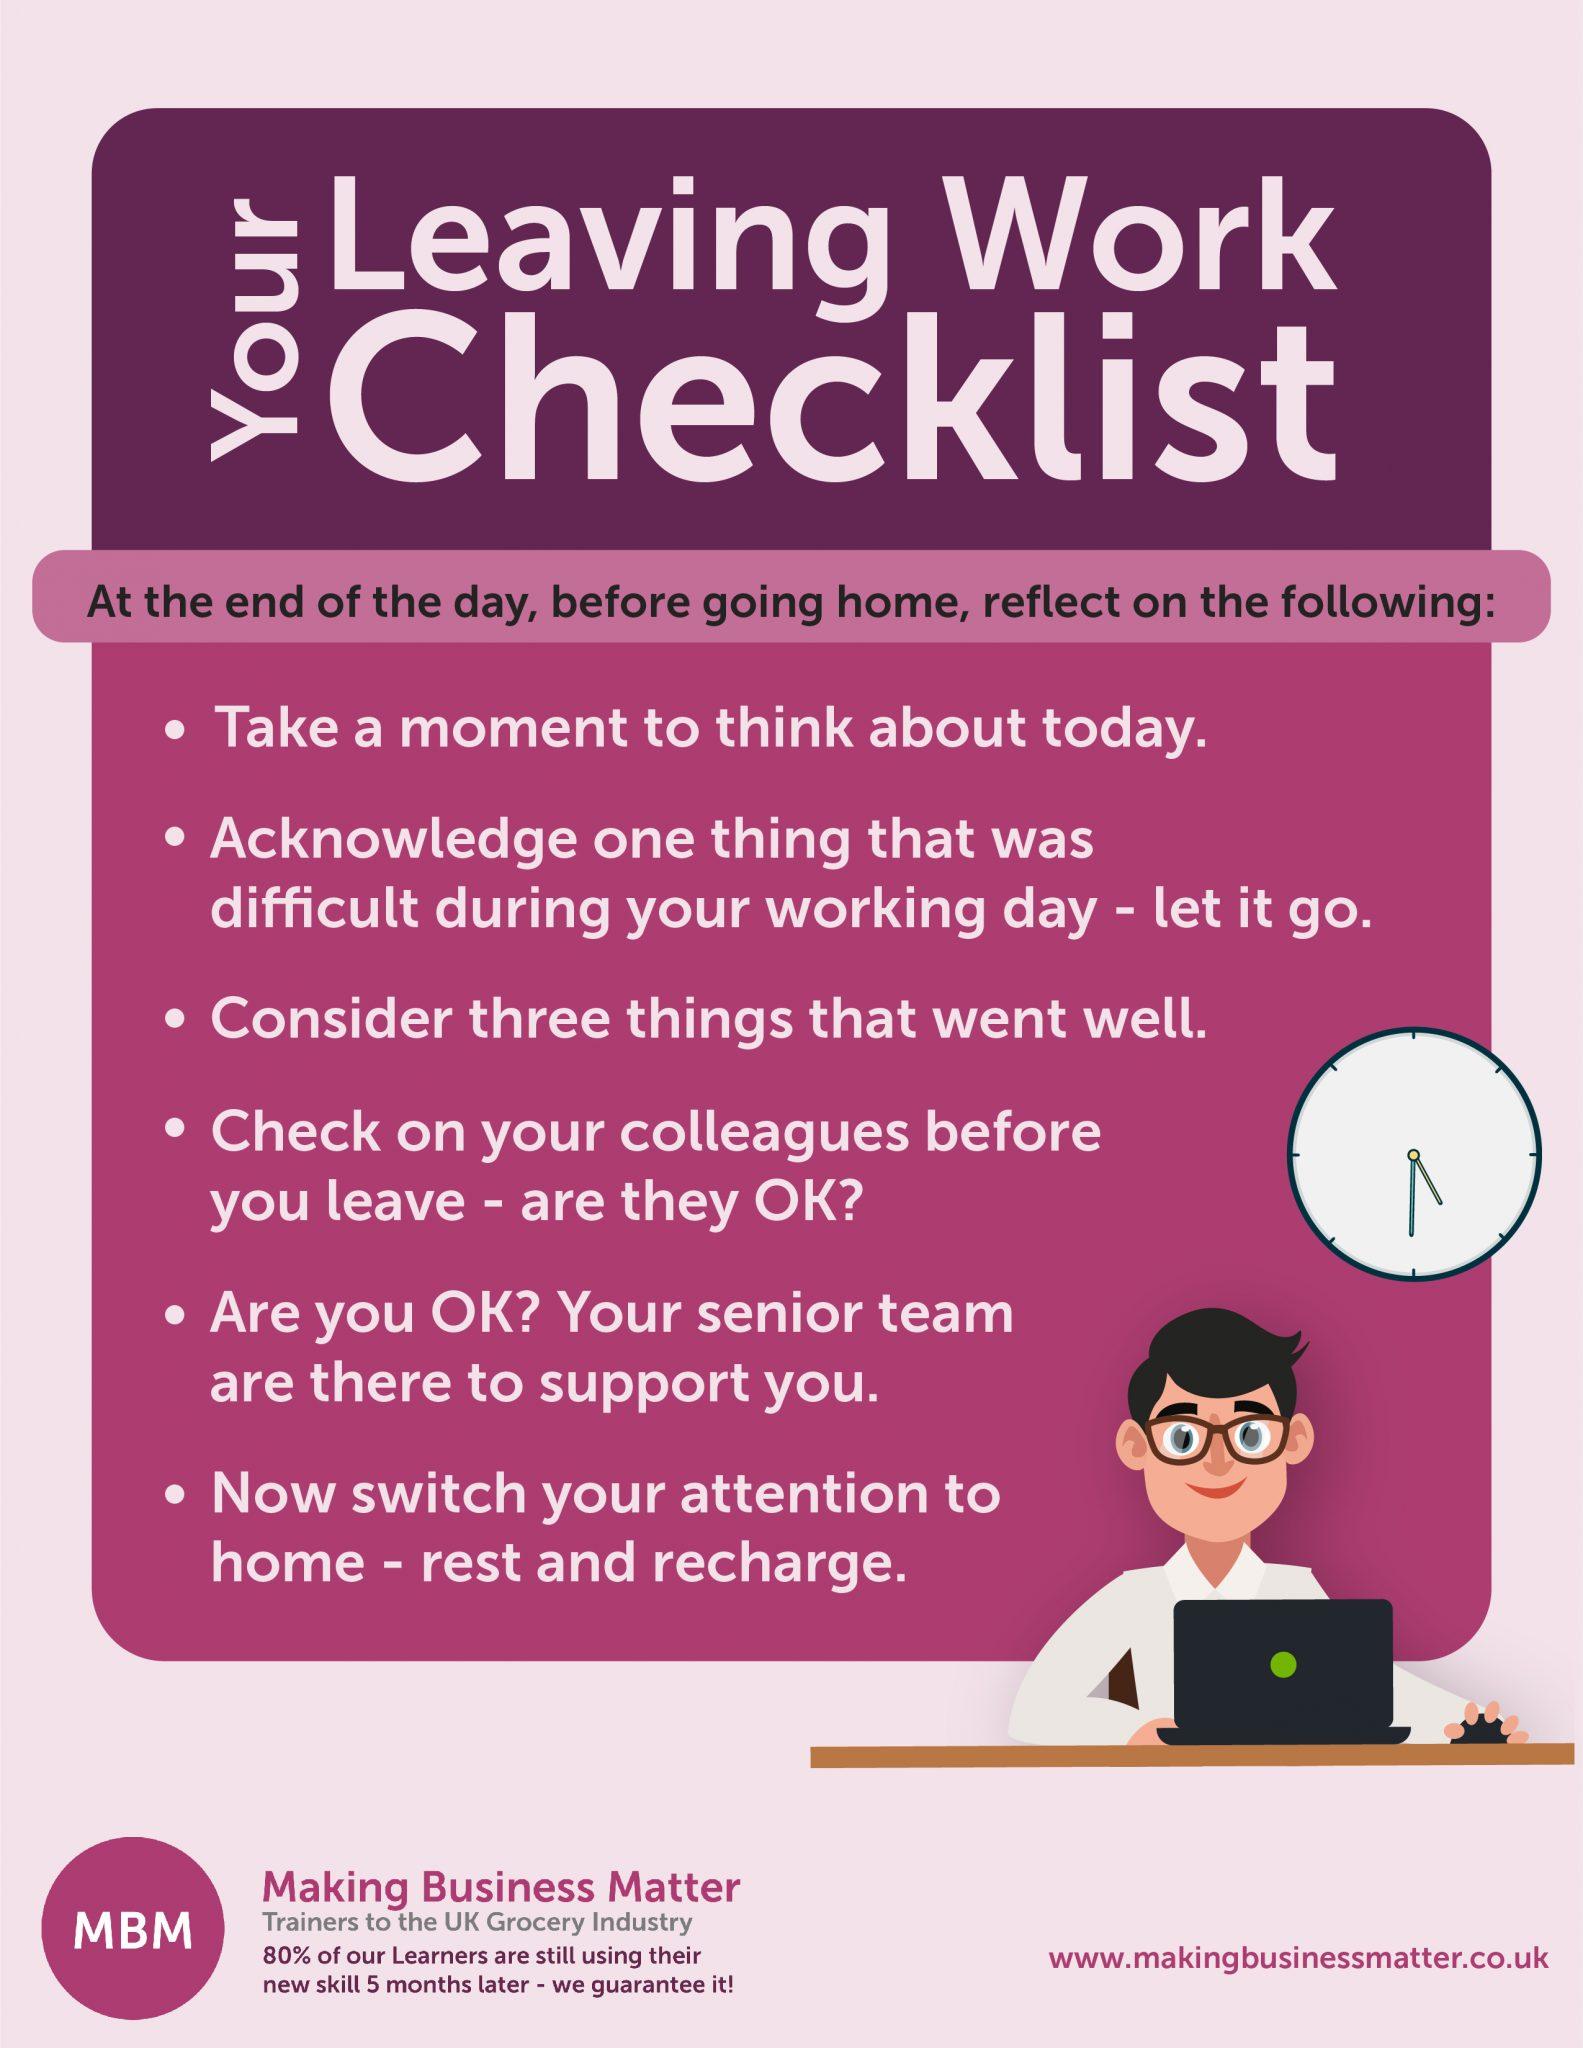 Leaving work checklist